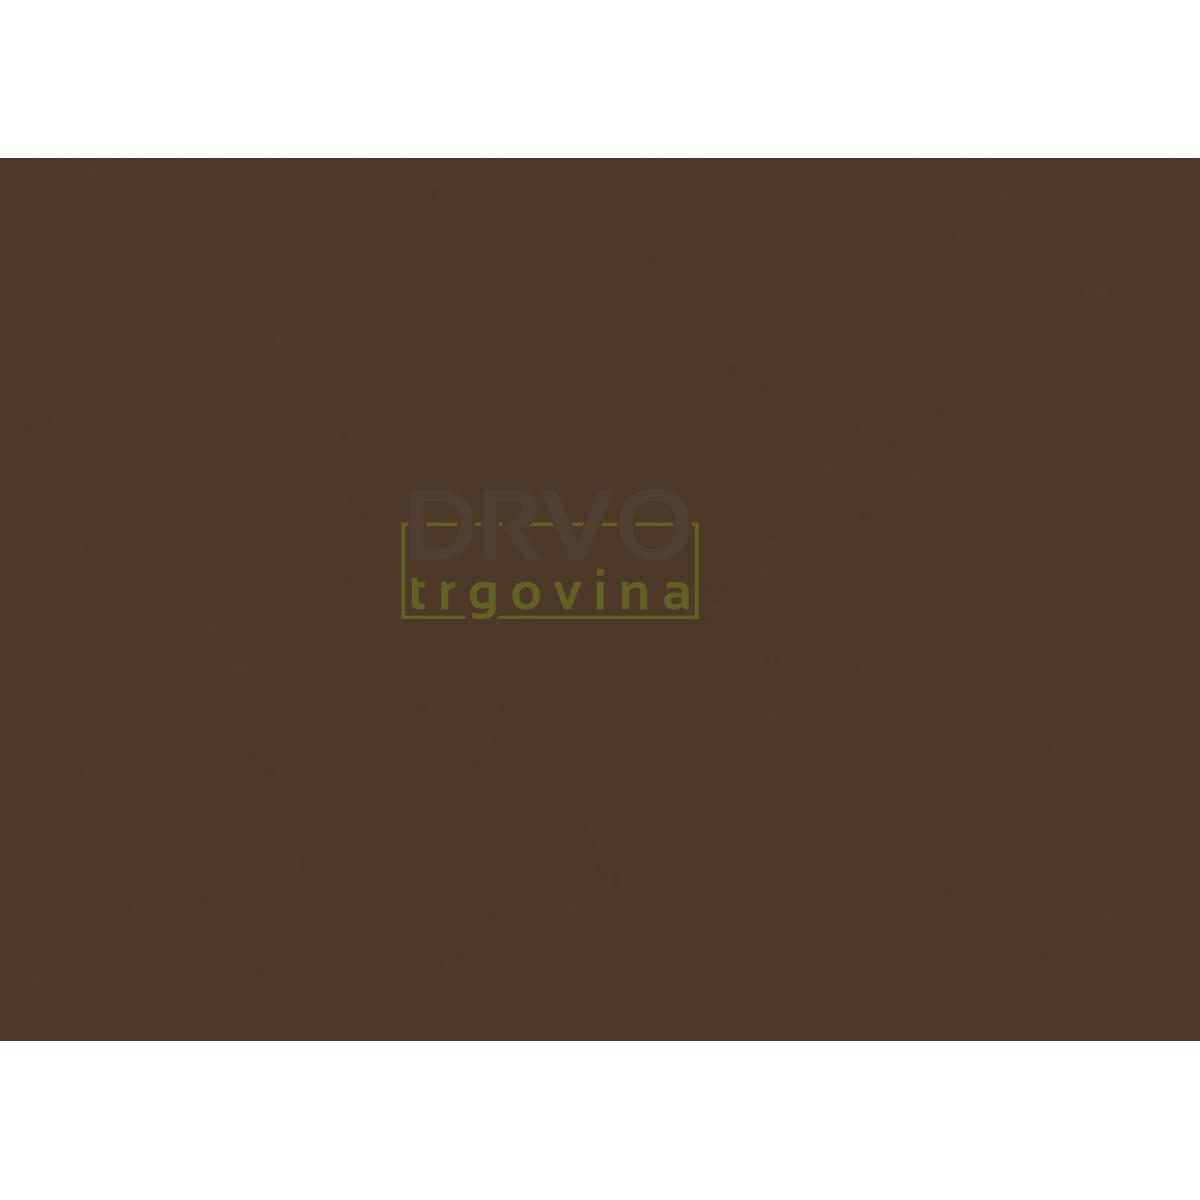 IVERICA OPLEMENJENA 182x BS DARK BROWN 18mm 2800/2070